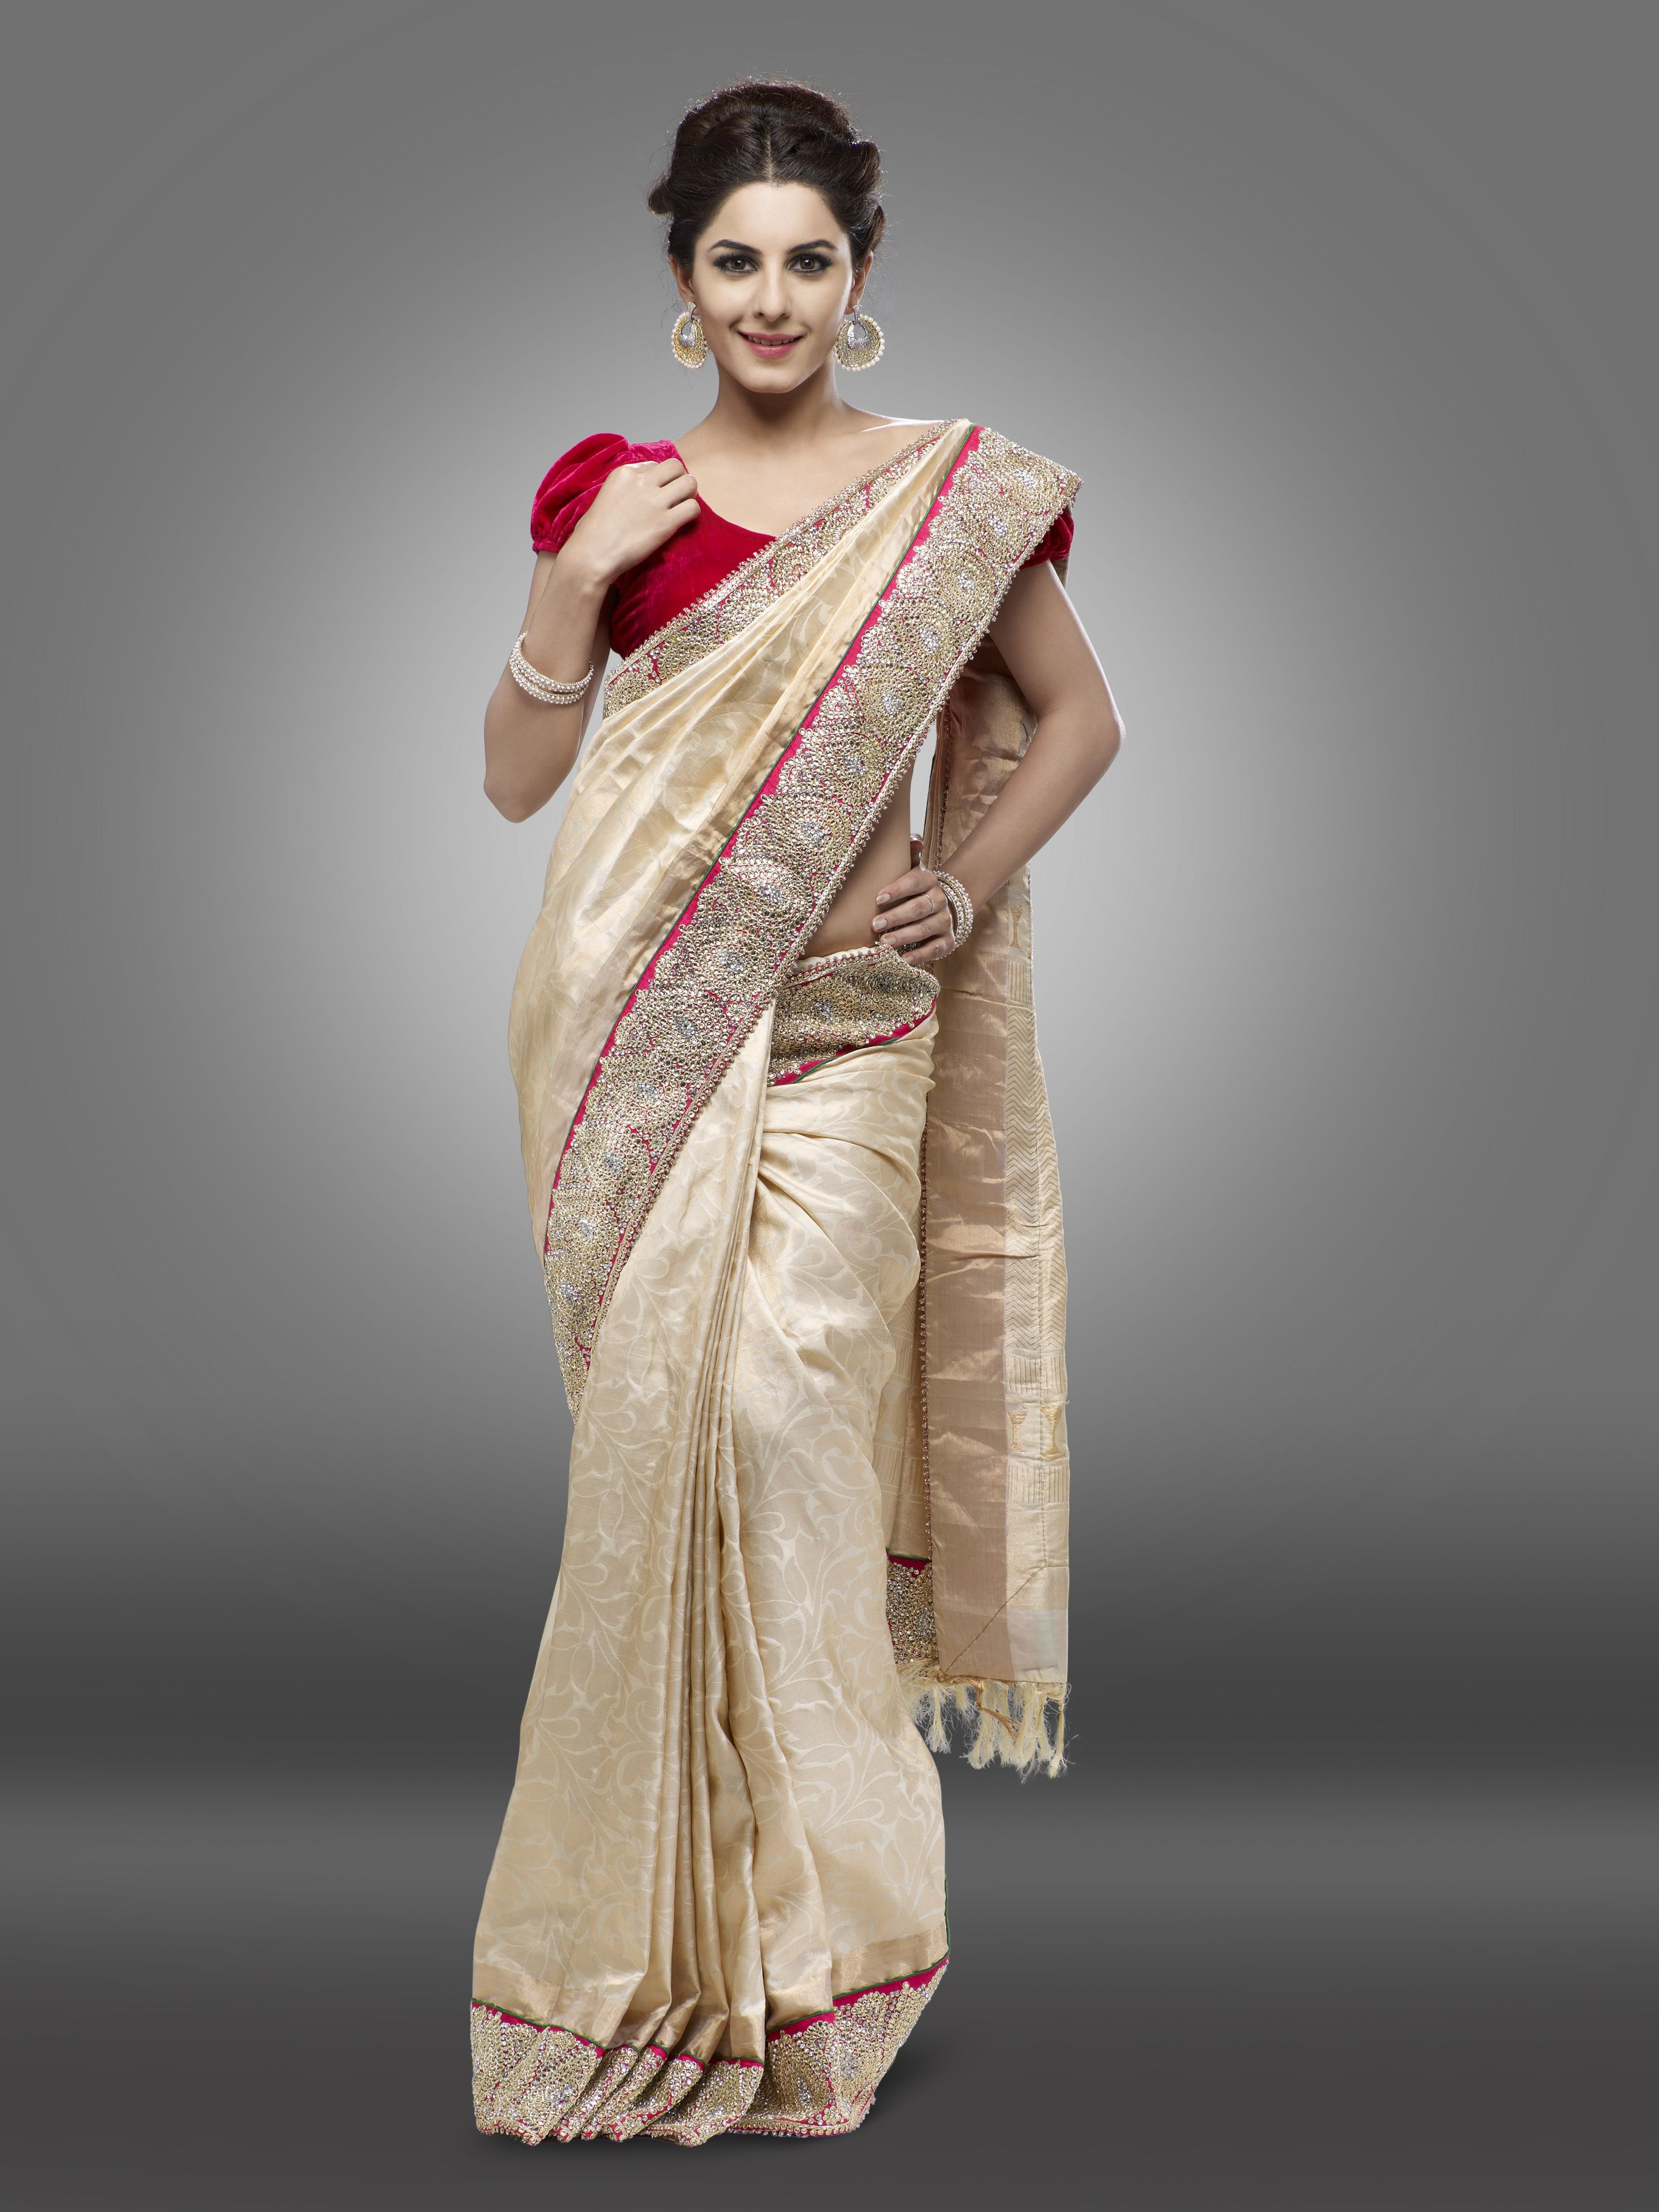 Saree Heavy Butti Red Work Border Bridal